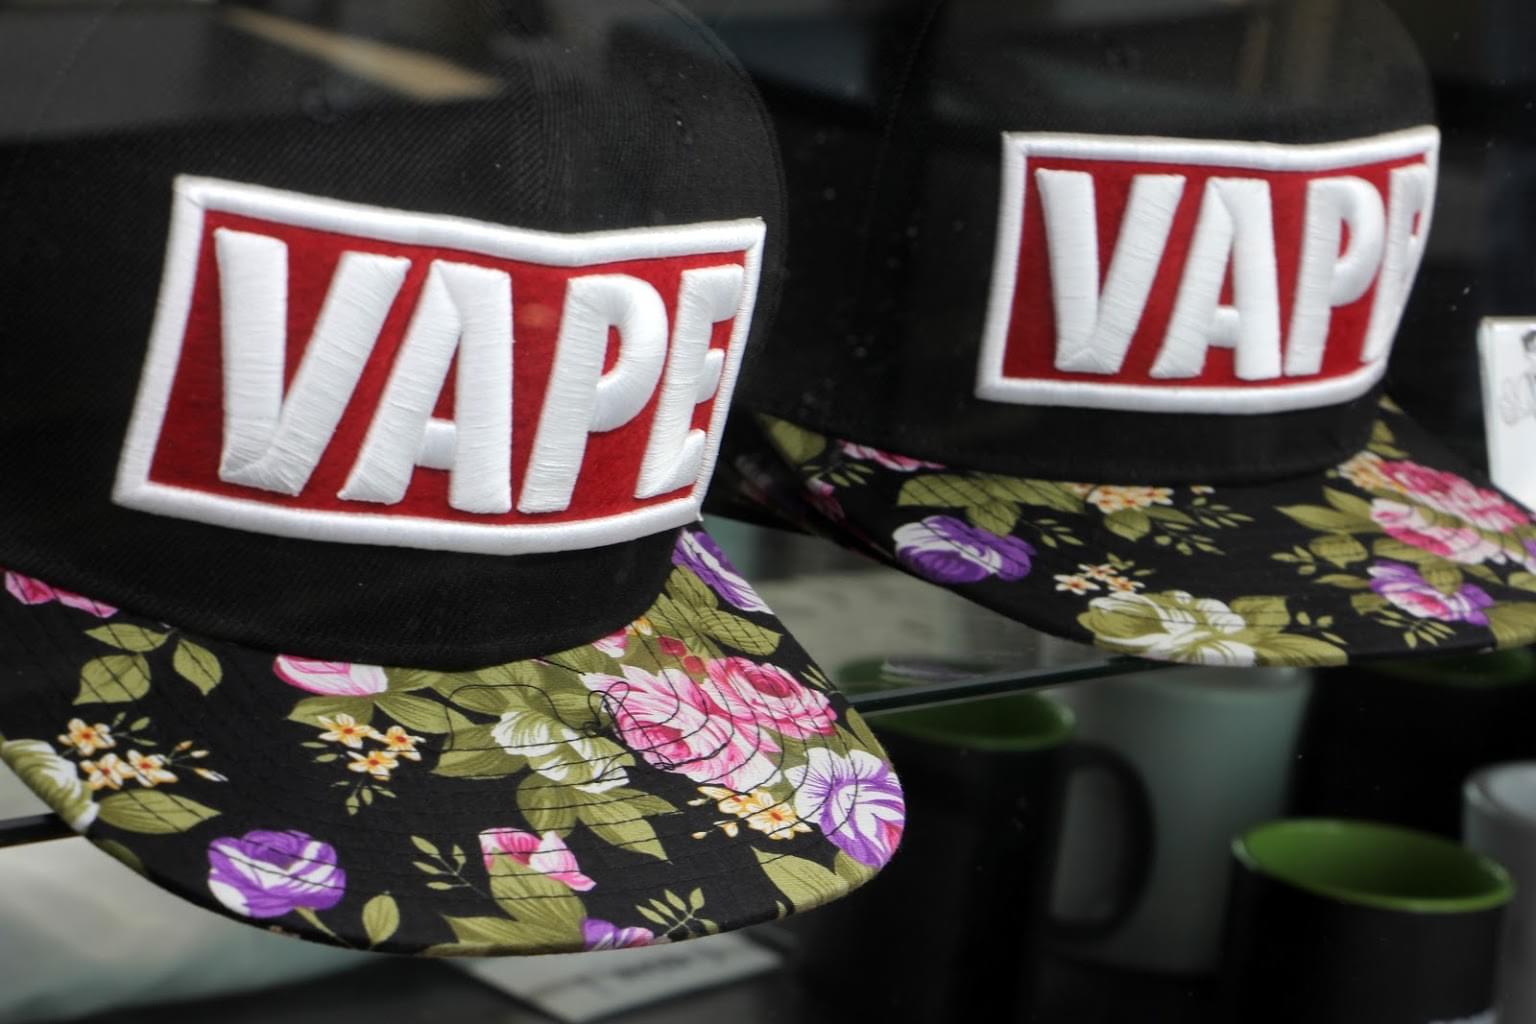 Good Guy Vapes North Plainfield, NJ Vaporizer Store baseball cap